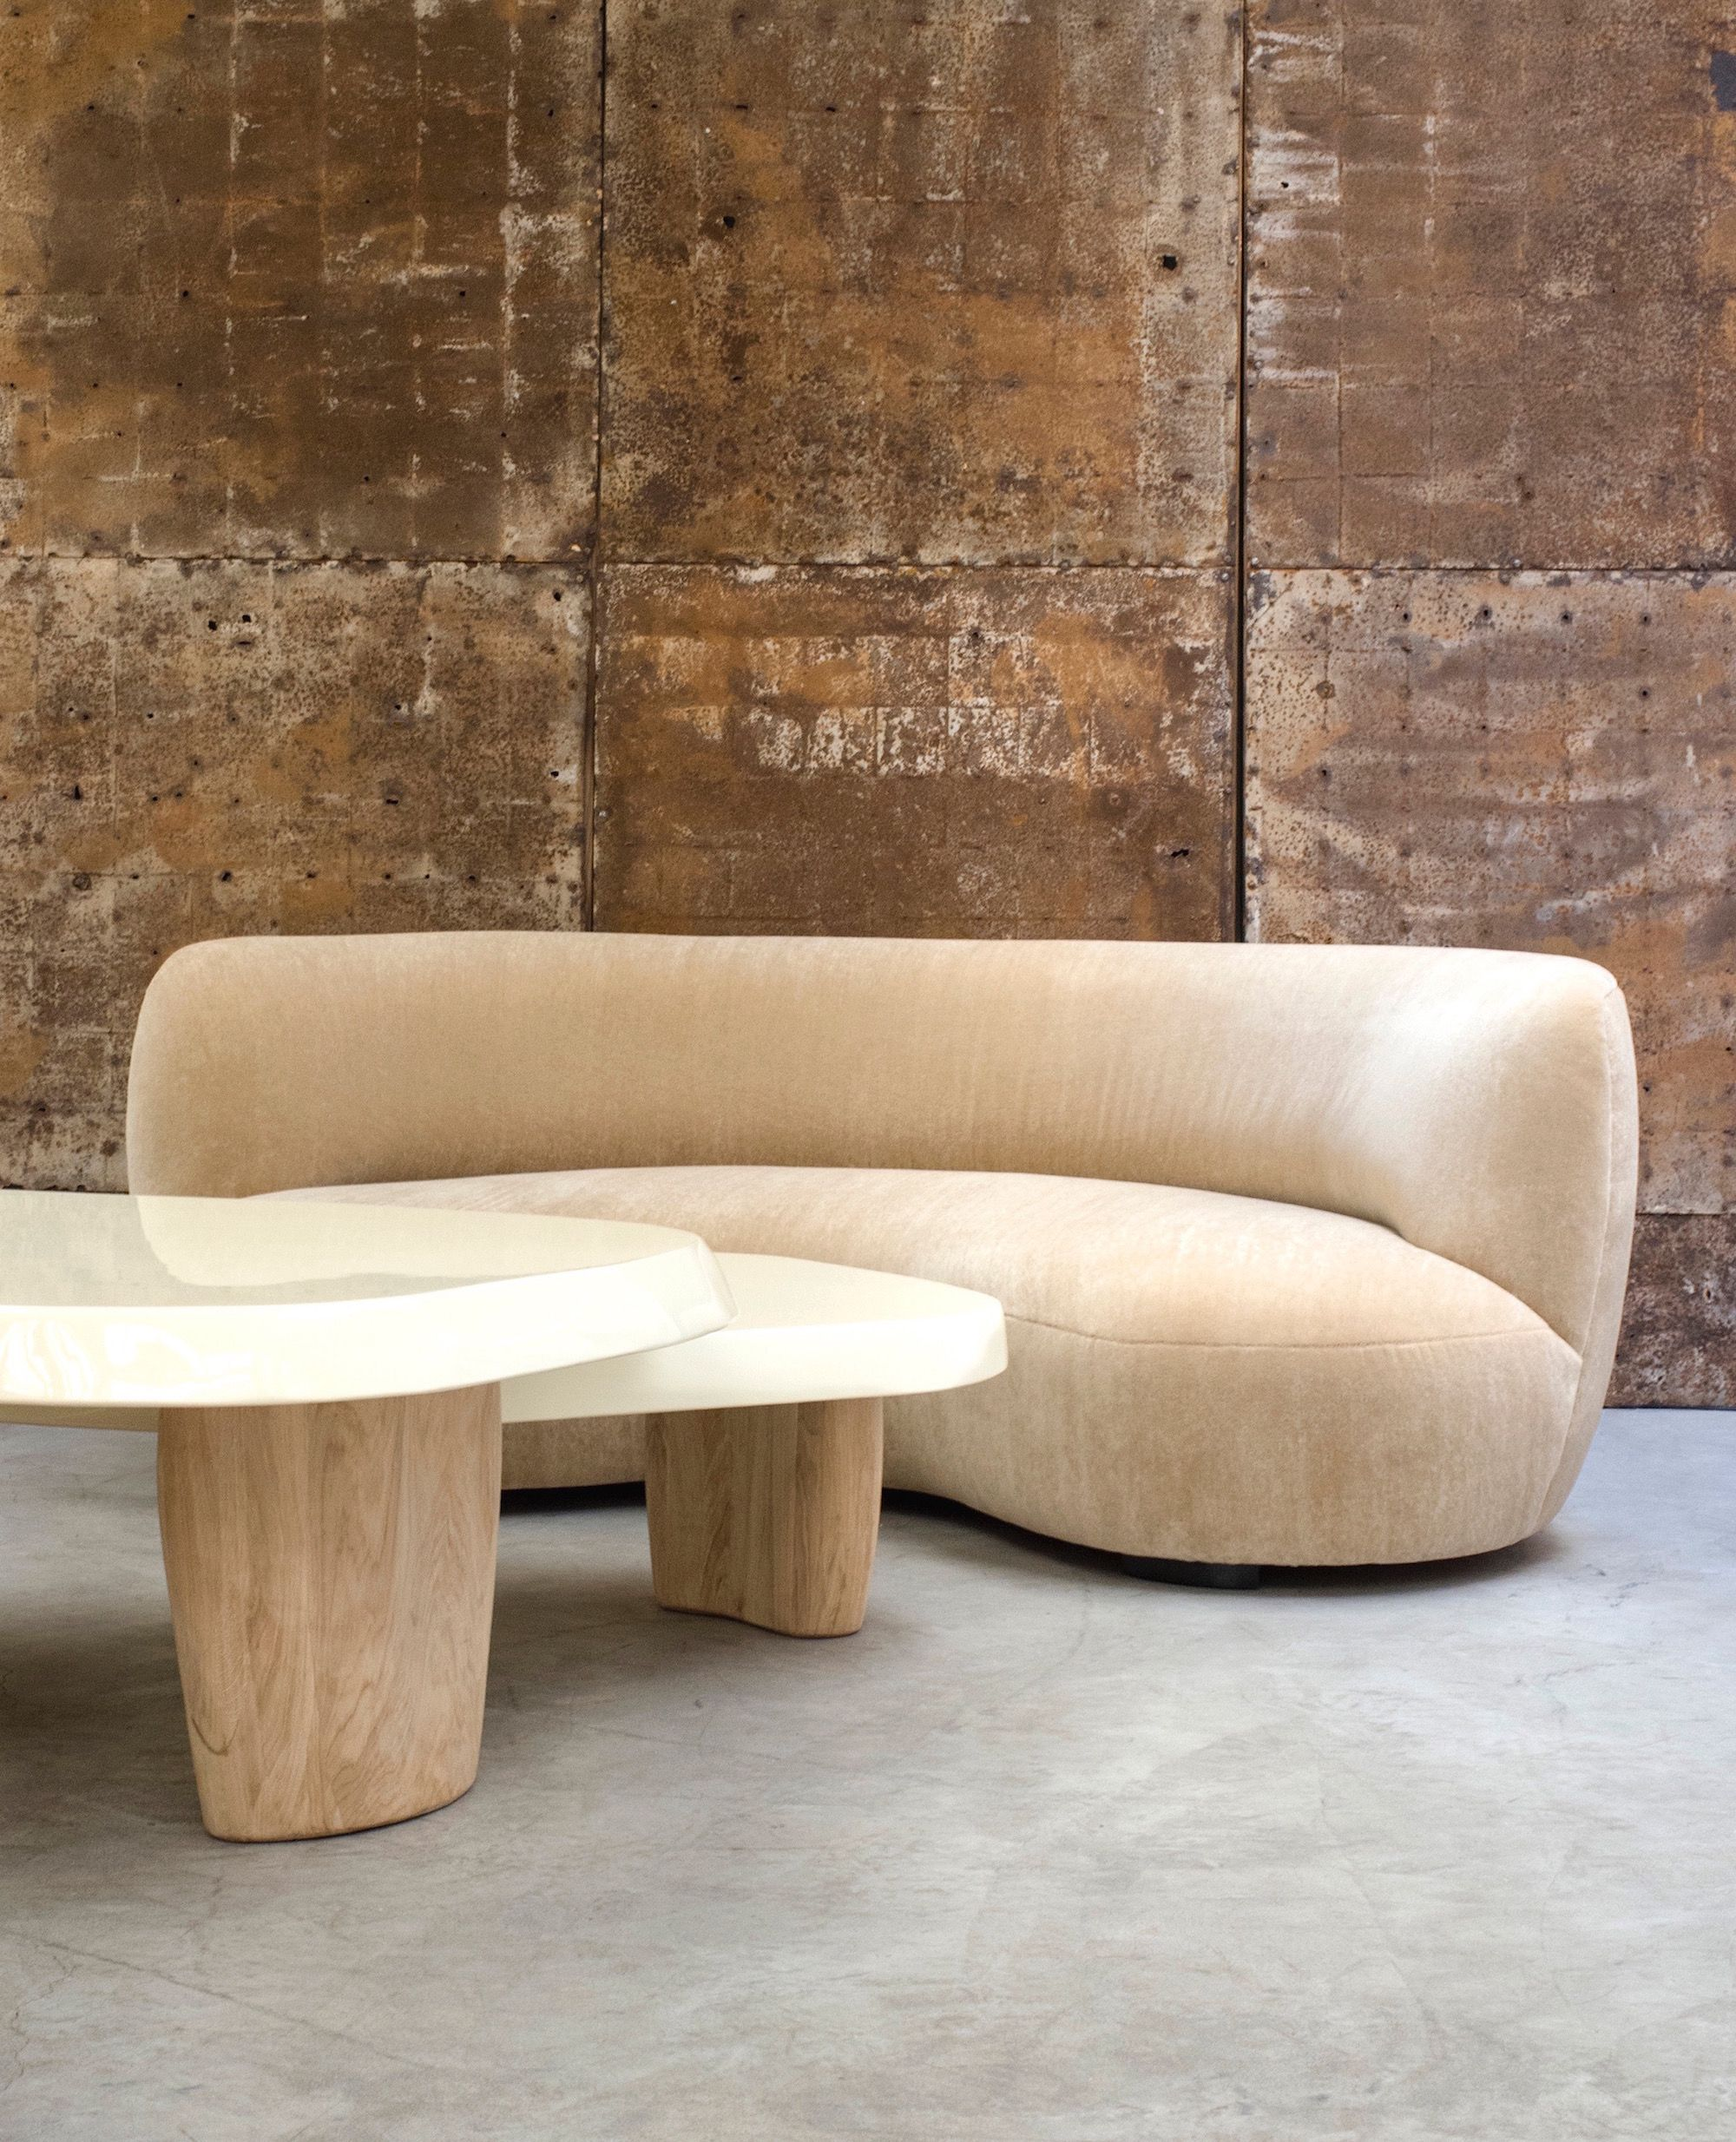 Contemporary Armless Sofa With Curved Lines Minimalist Sofa Interior Design Curved Sofa